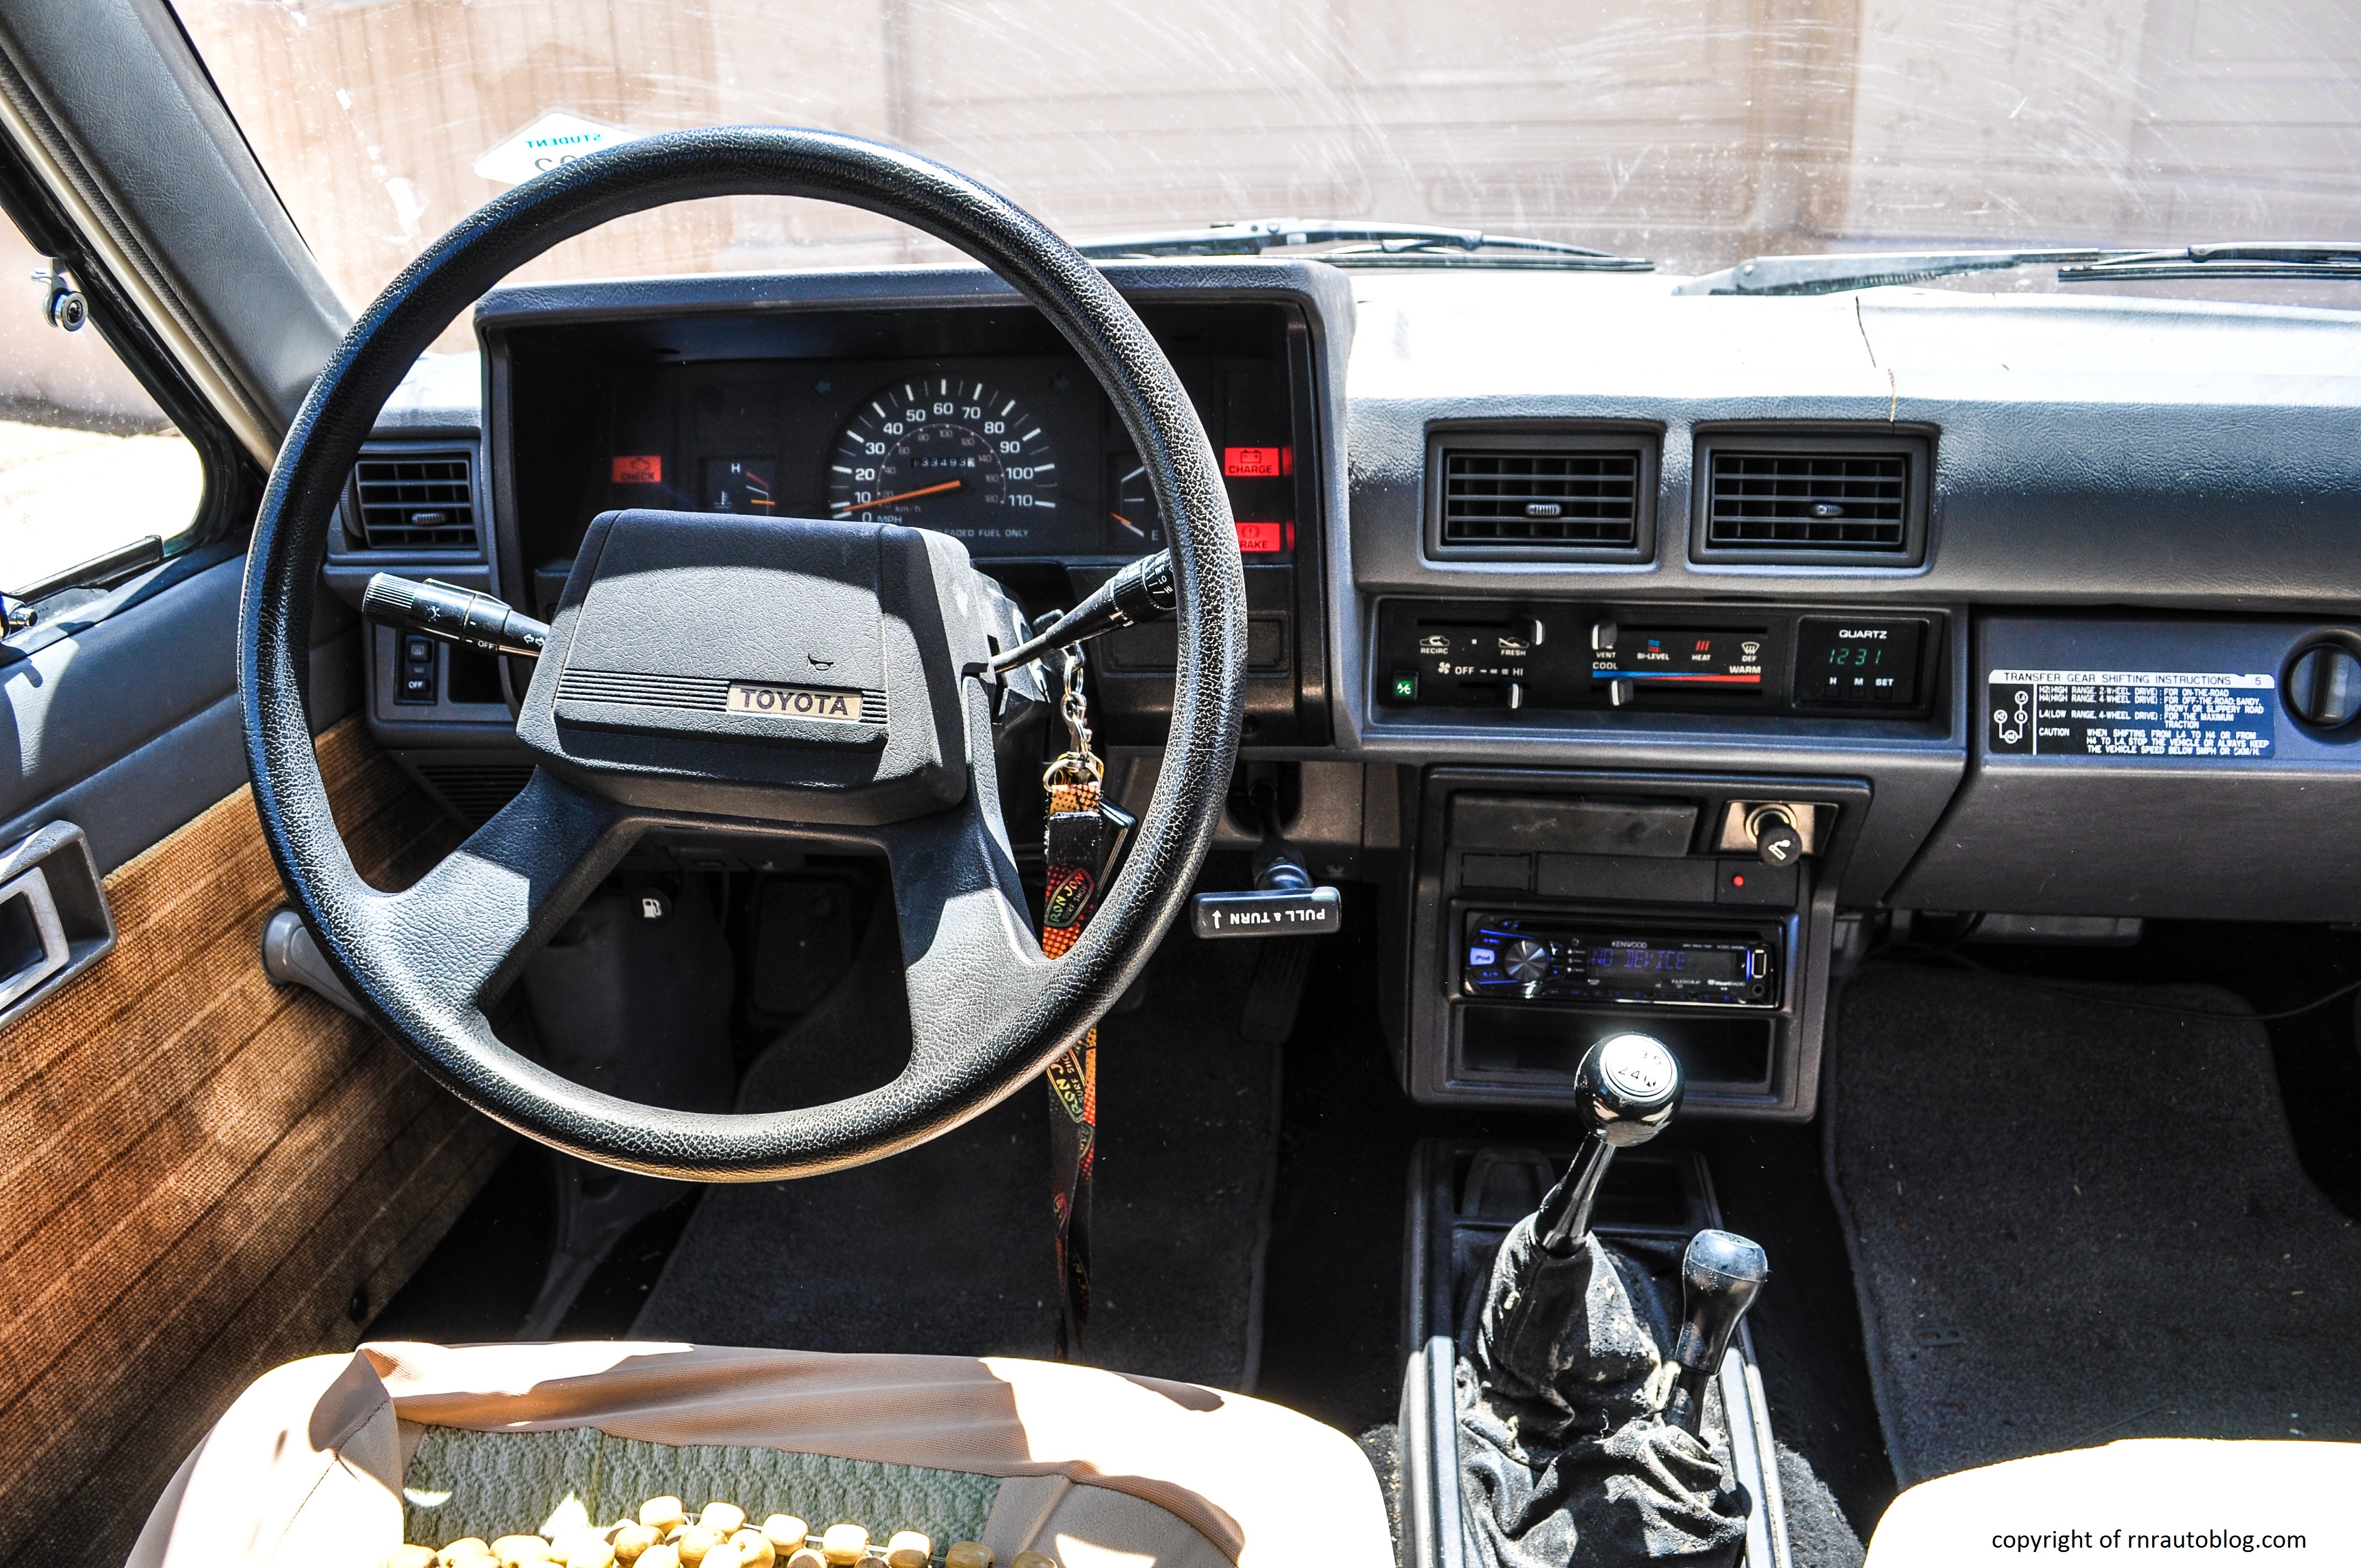 1986 Toyota 4runner Sr5 Review Rnr Automotive Blog